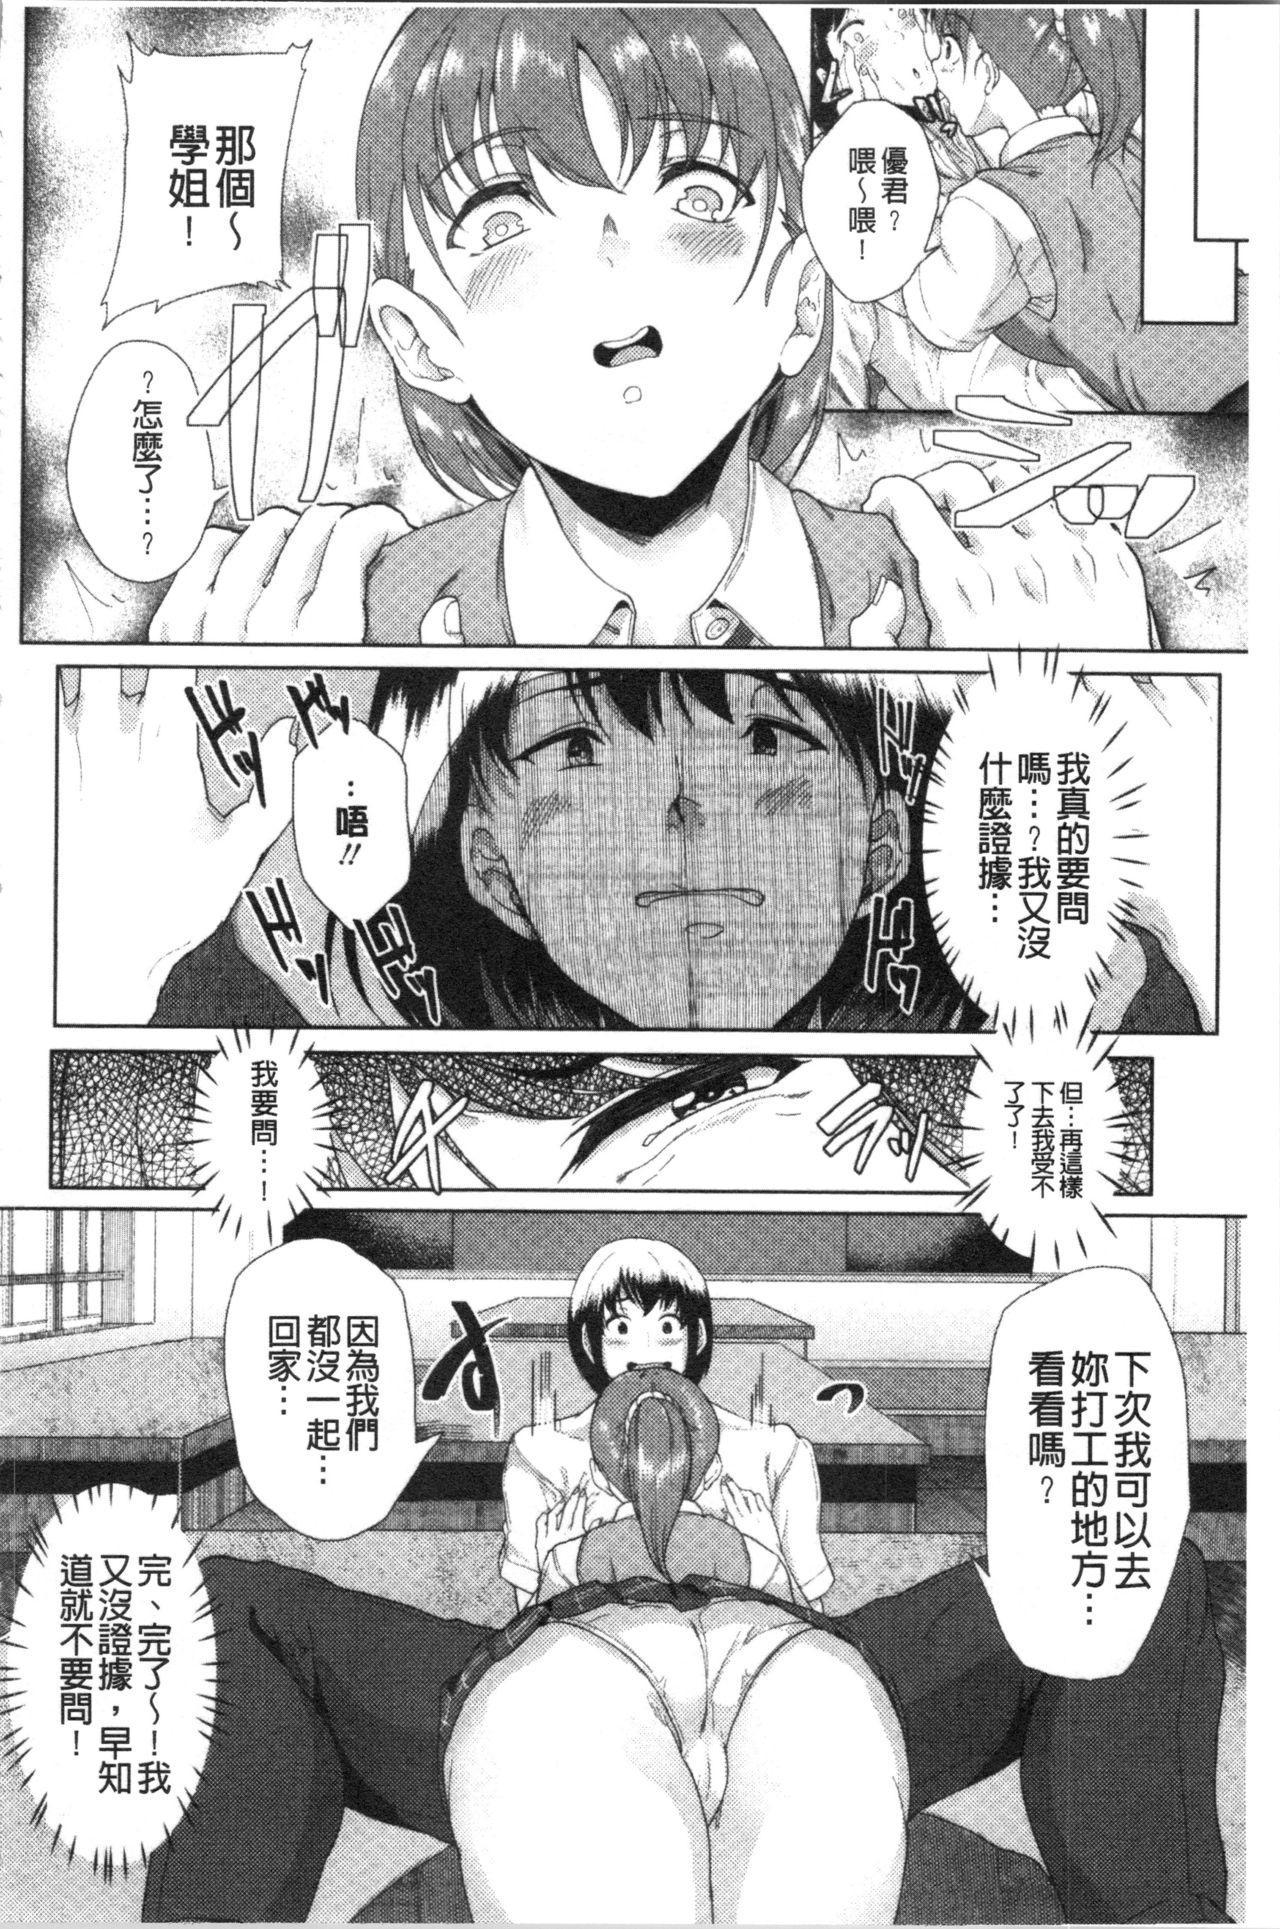 Kanojo ga SEX ni nare teru wake | 女友對激情性愛變很習慣的理由 30